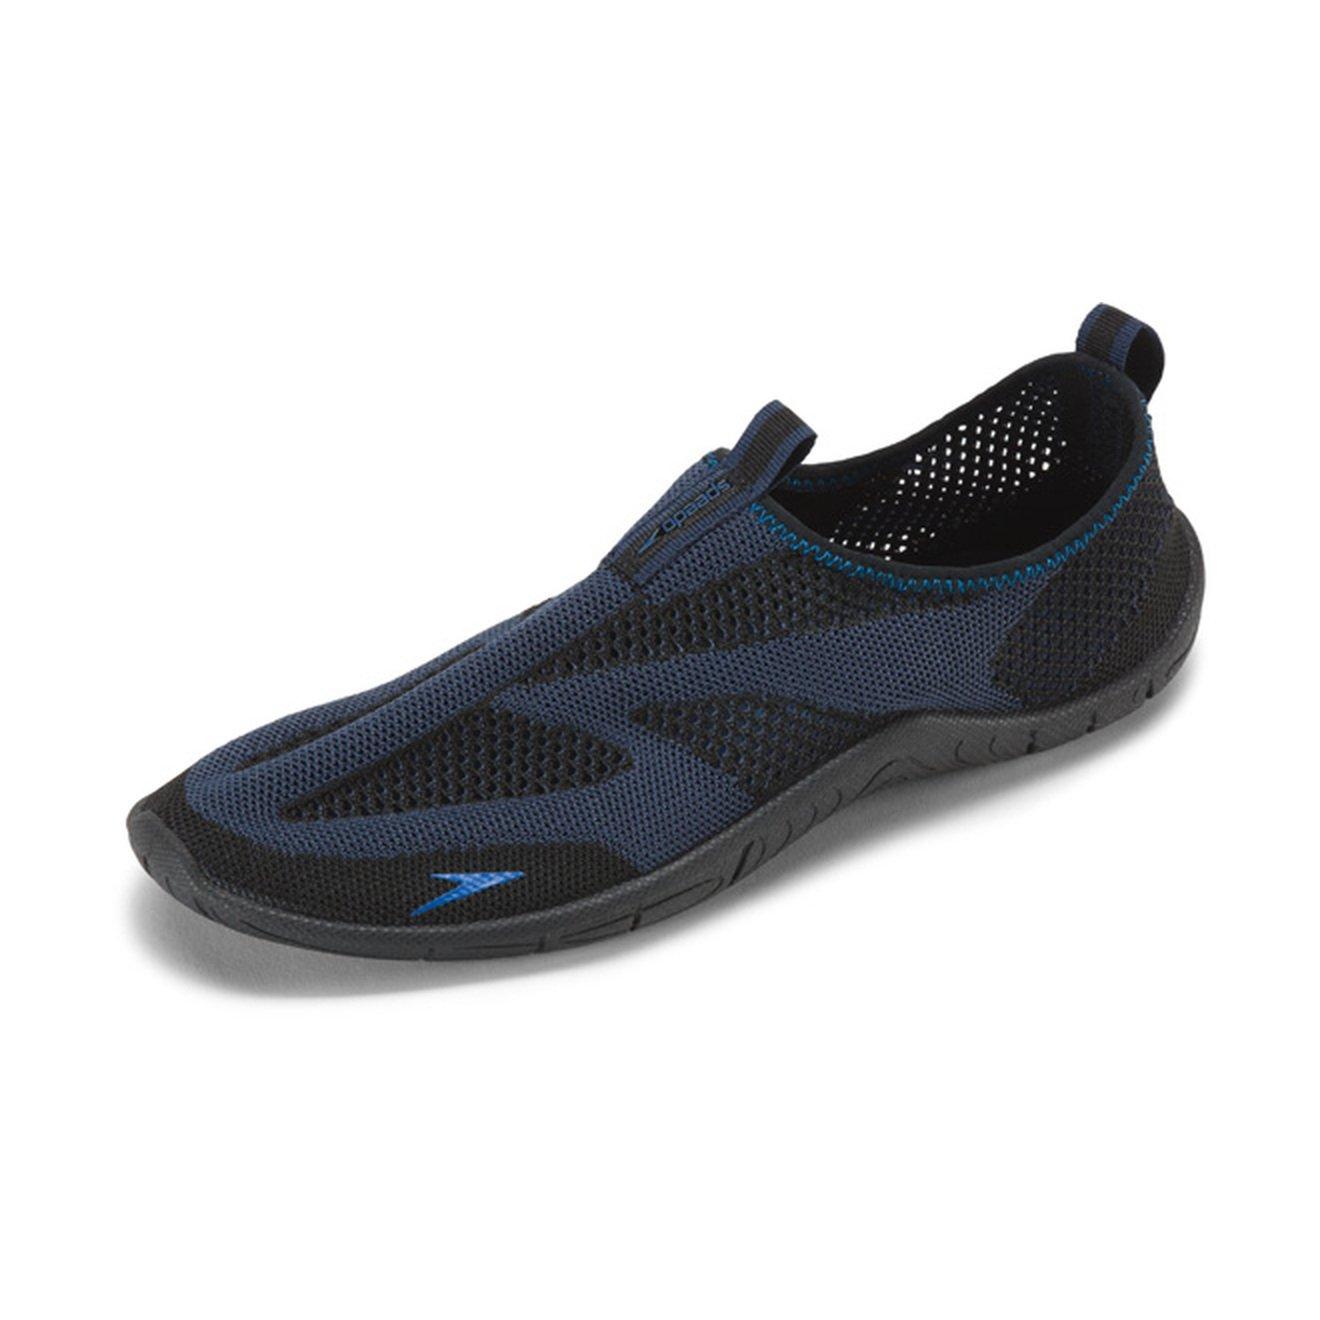 Speedo Men's Surf Knit Athletic Water Shoe, Navy/Blue, 11 C/D US by Speedo